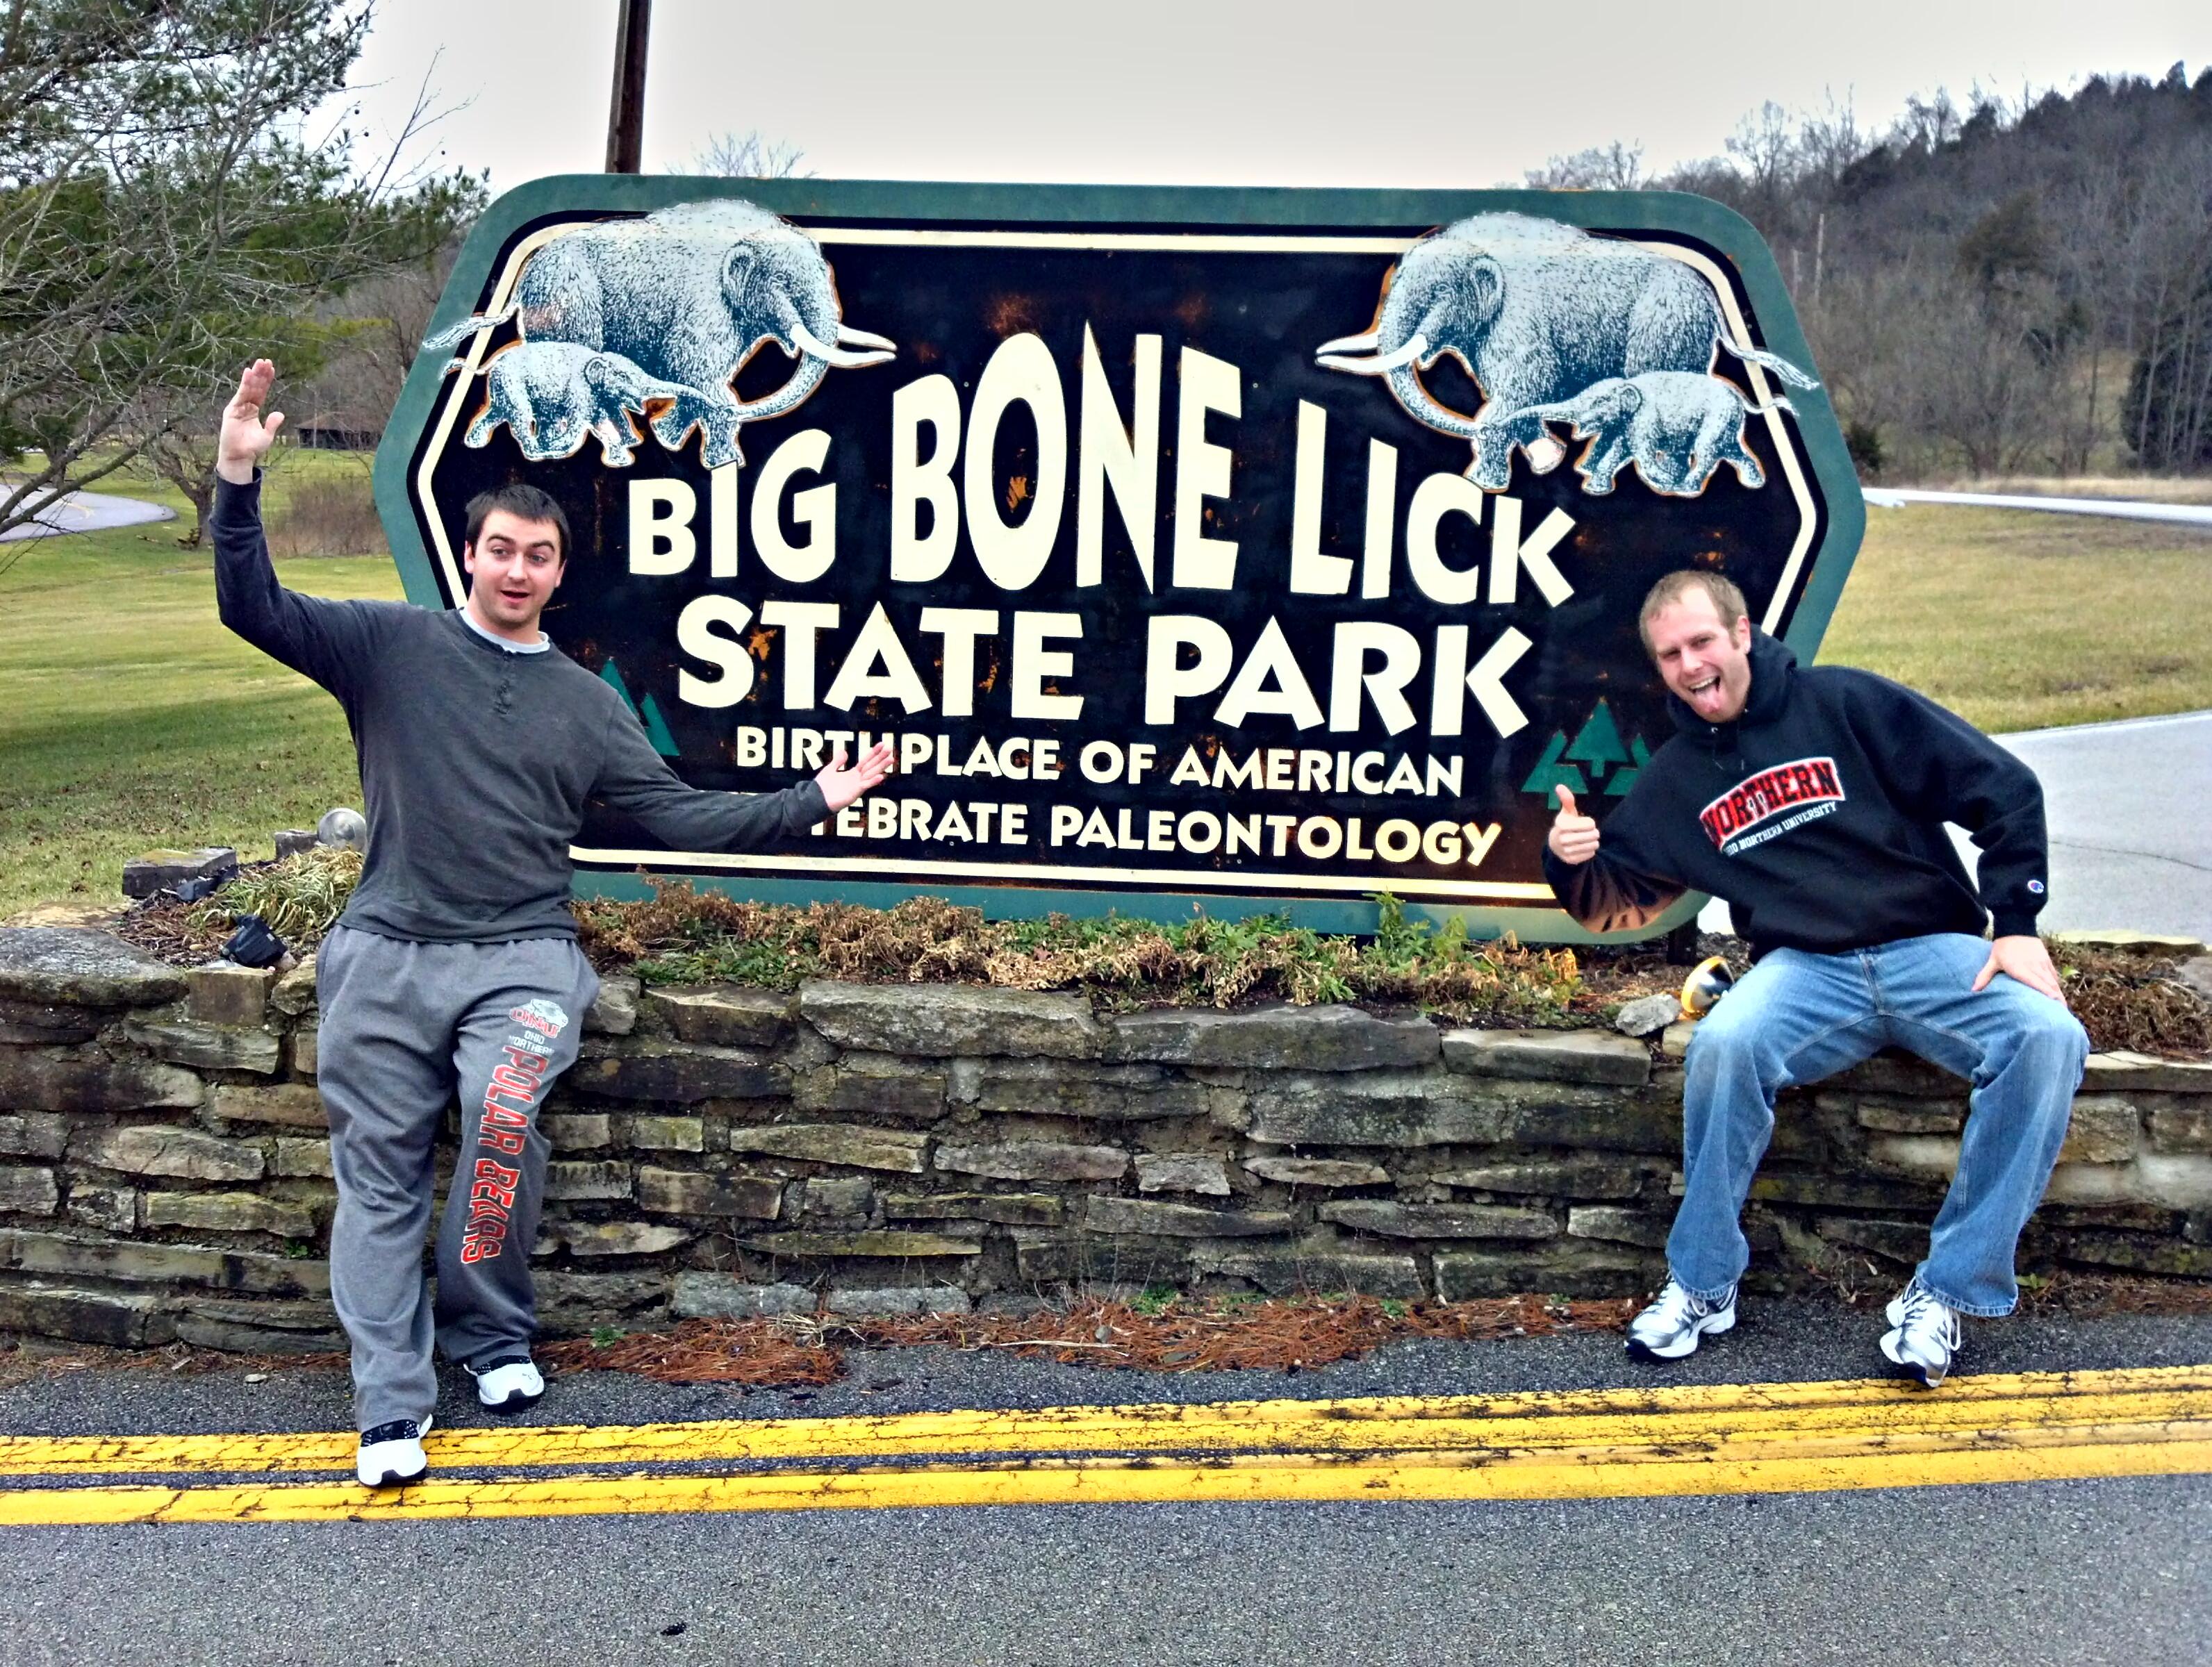 Big bone lick park state really. happens